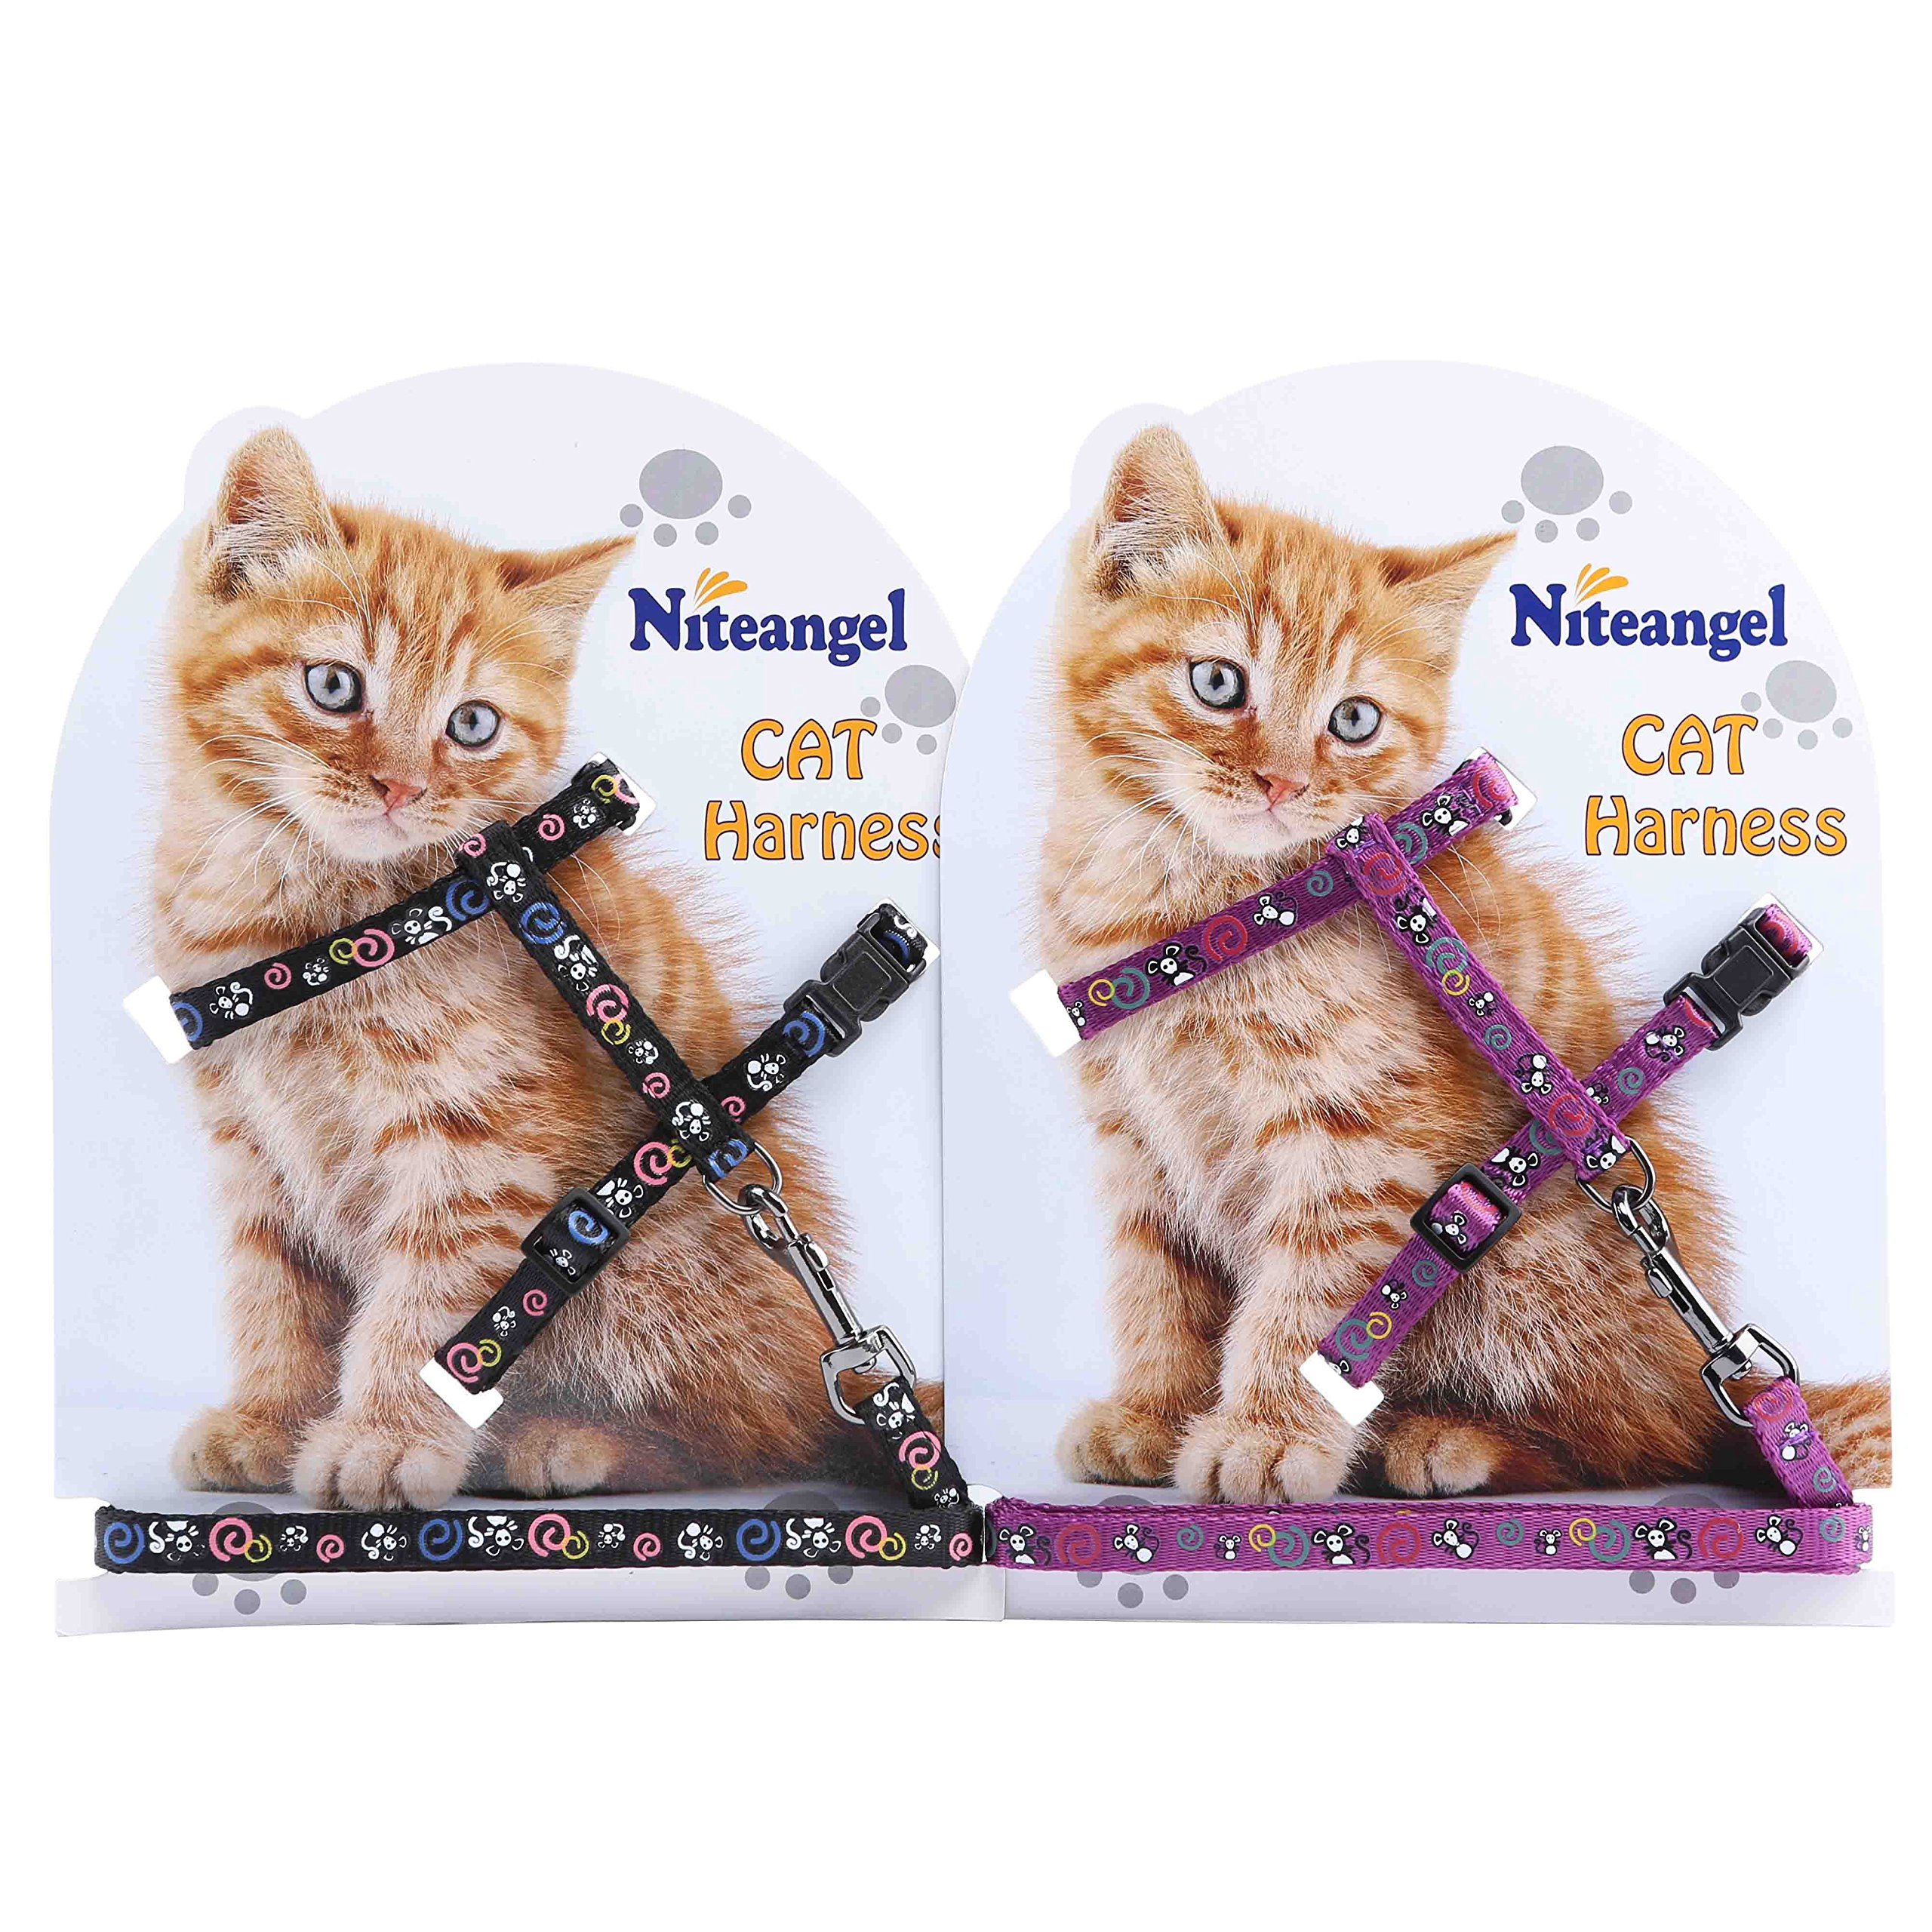 Niteangel 2 Pack of Adjustable Cat Harness & Leash Set